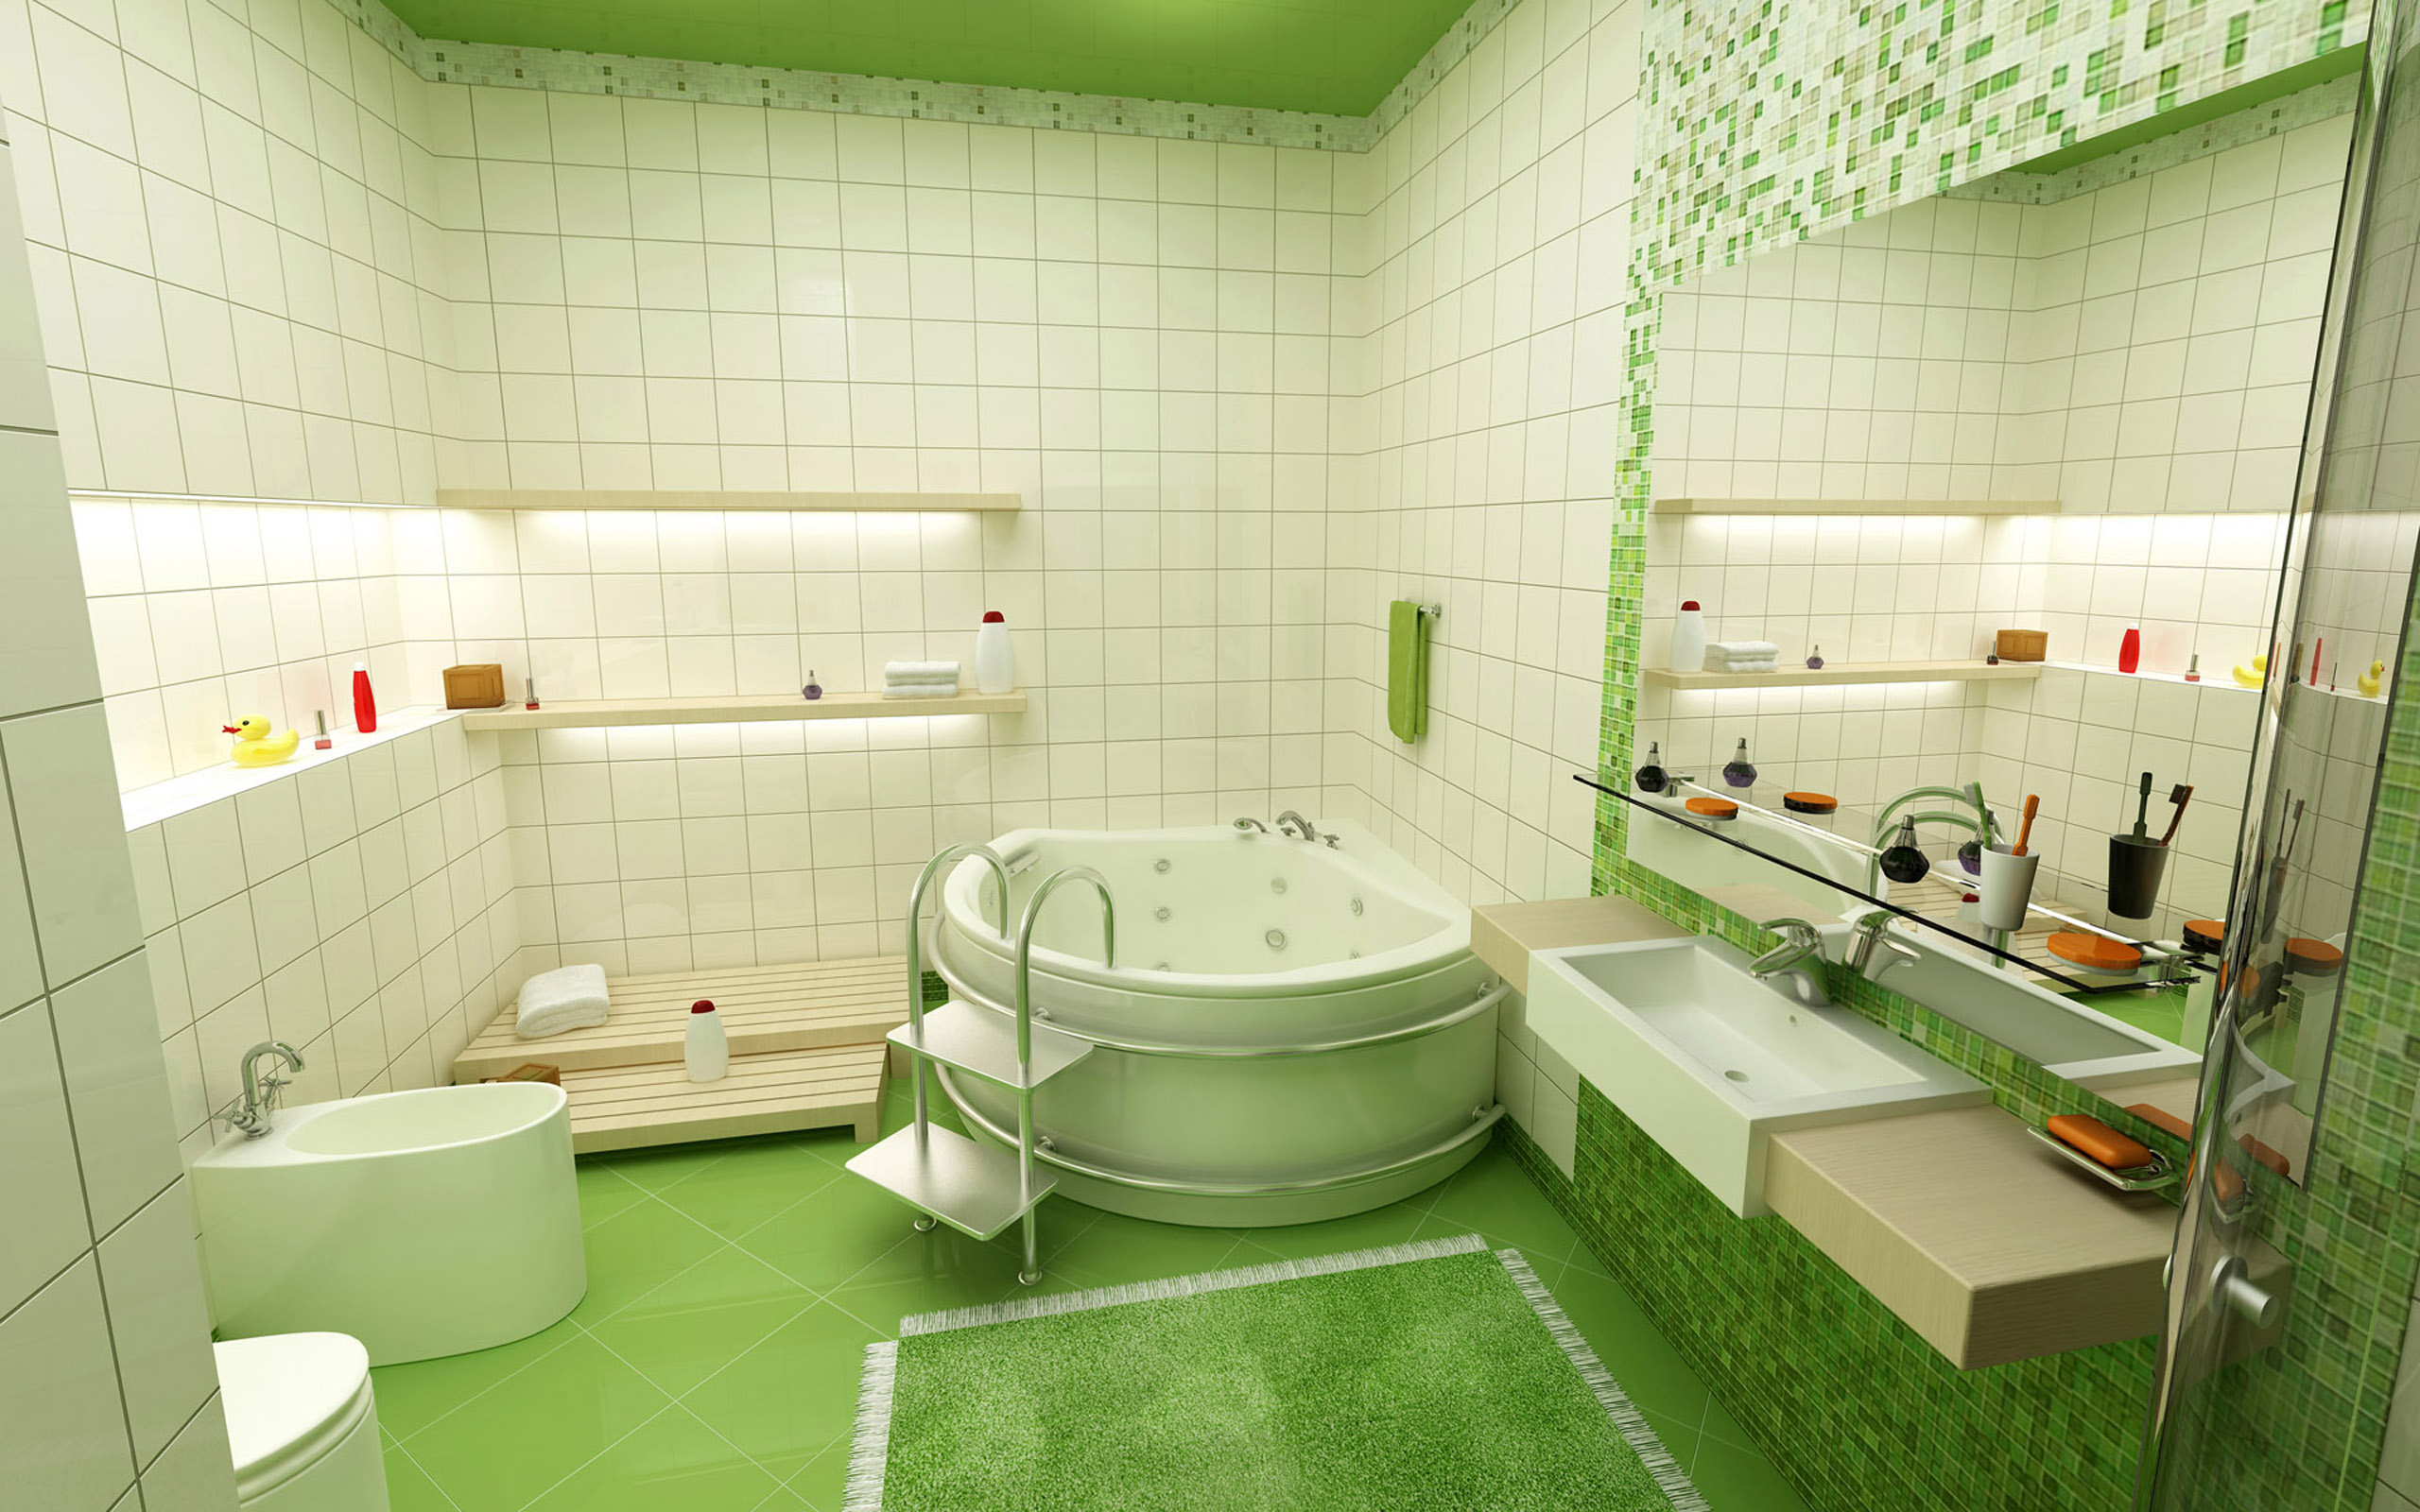 http://www.thewallpapers.org/photo/23563/green-bathroom.jpg